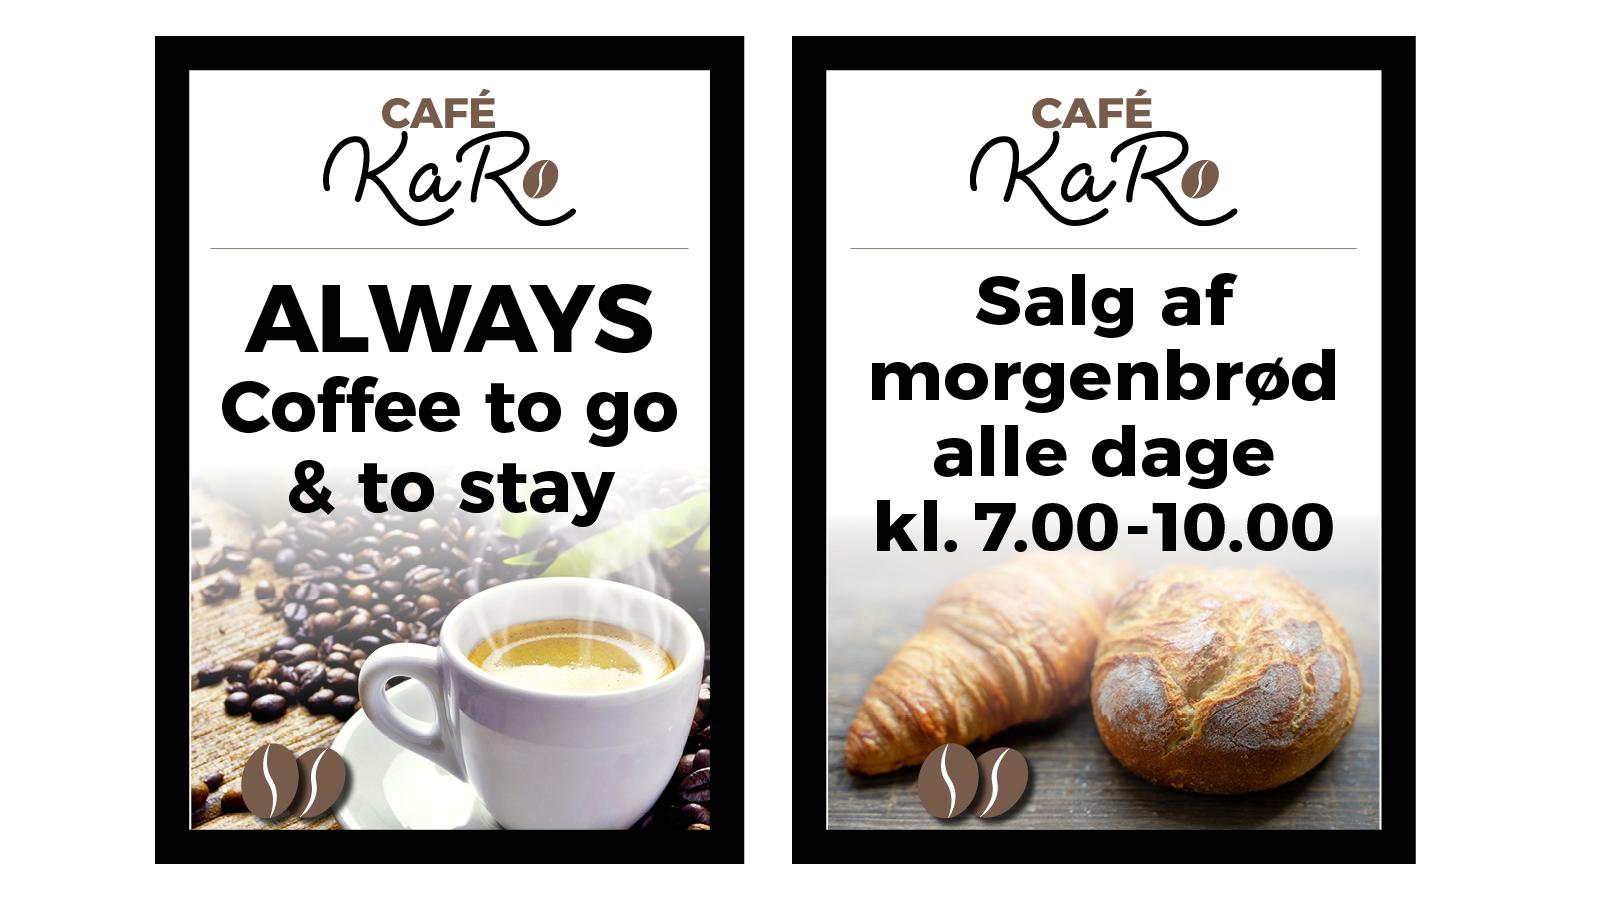 Cafe KaRo 1600x900 px_plakater